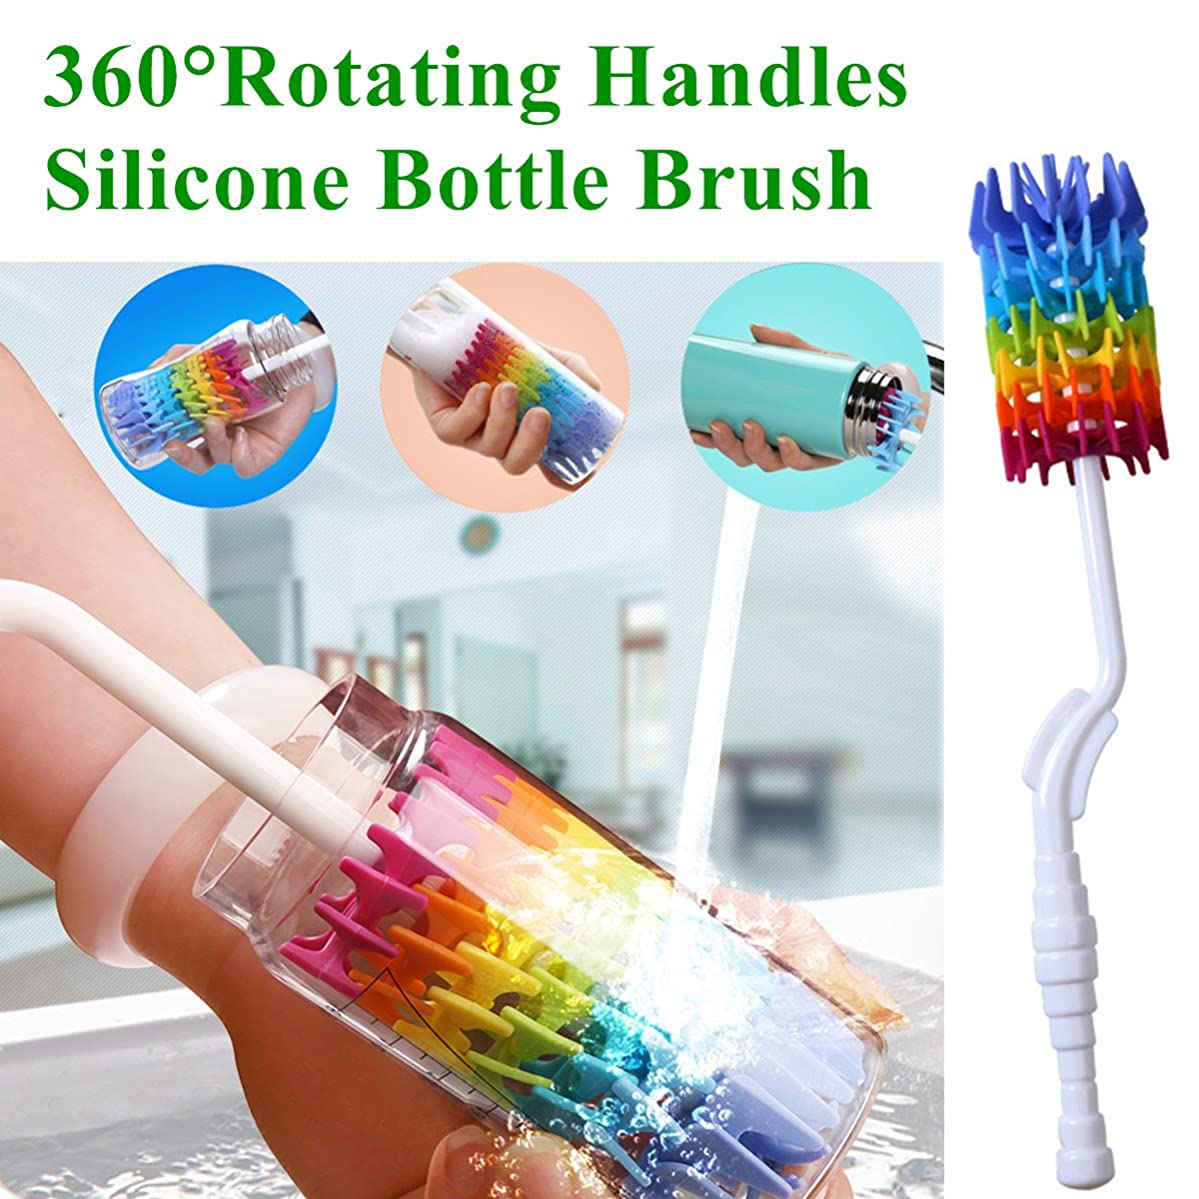 Bottle Brush Cleaner-Baby Milk Bottle Cleaner Soft Silicone Bottle Brusher / 360 Degree Rotating Long Handle Brush for Washing Glassware, Cup, Decanter, Narrow Neck Brewing Bottle